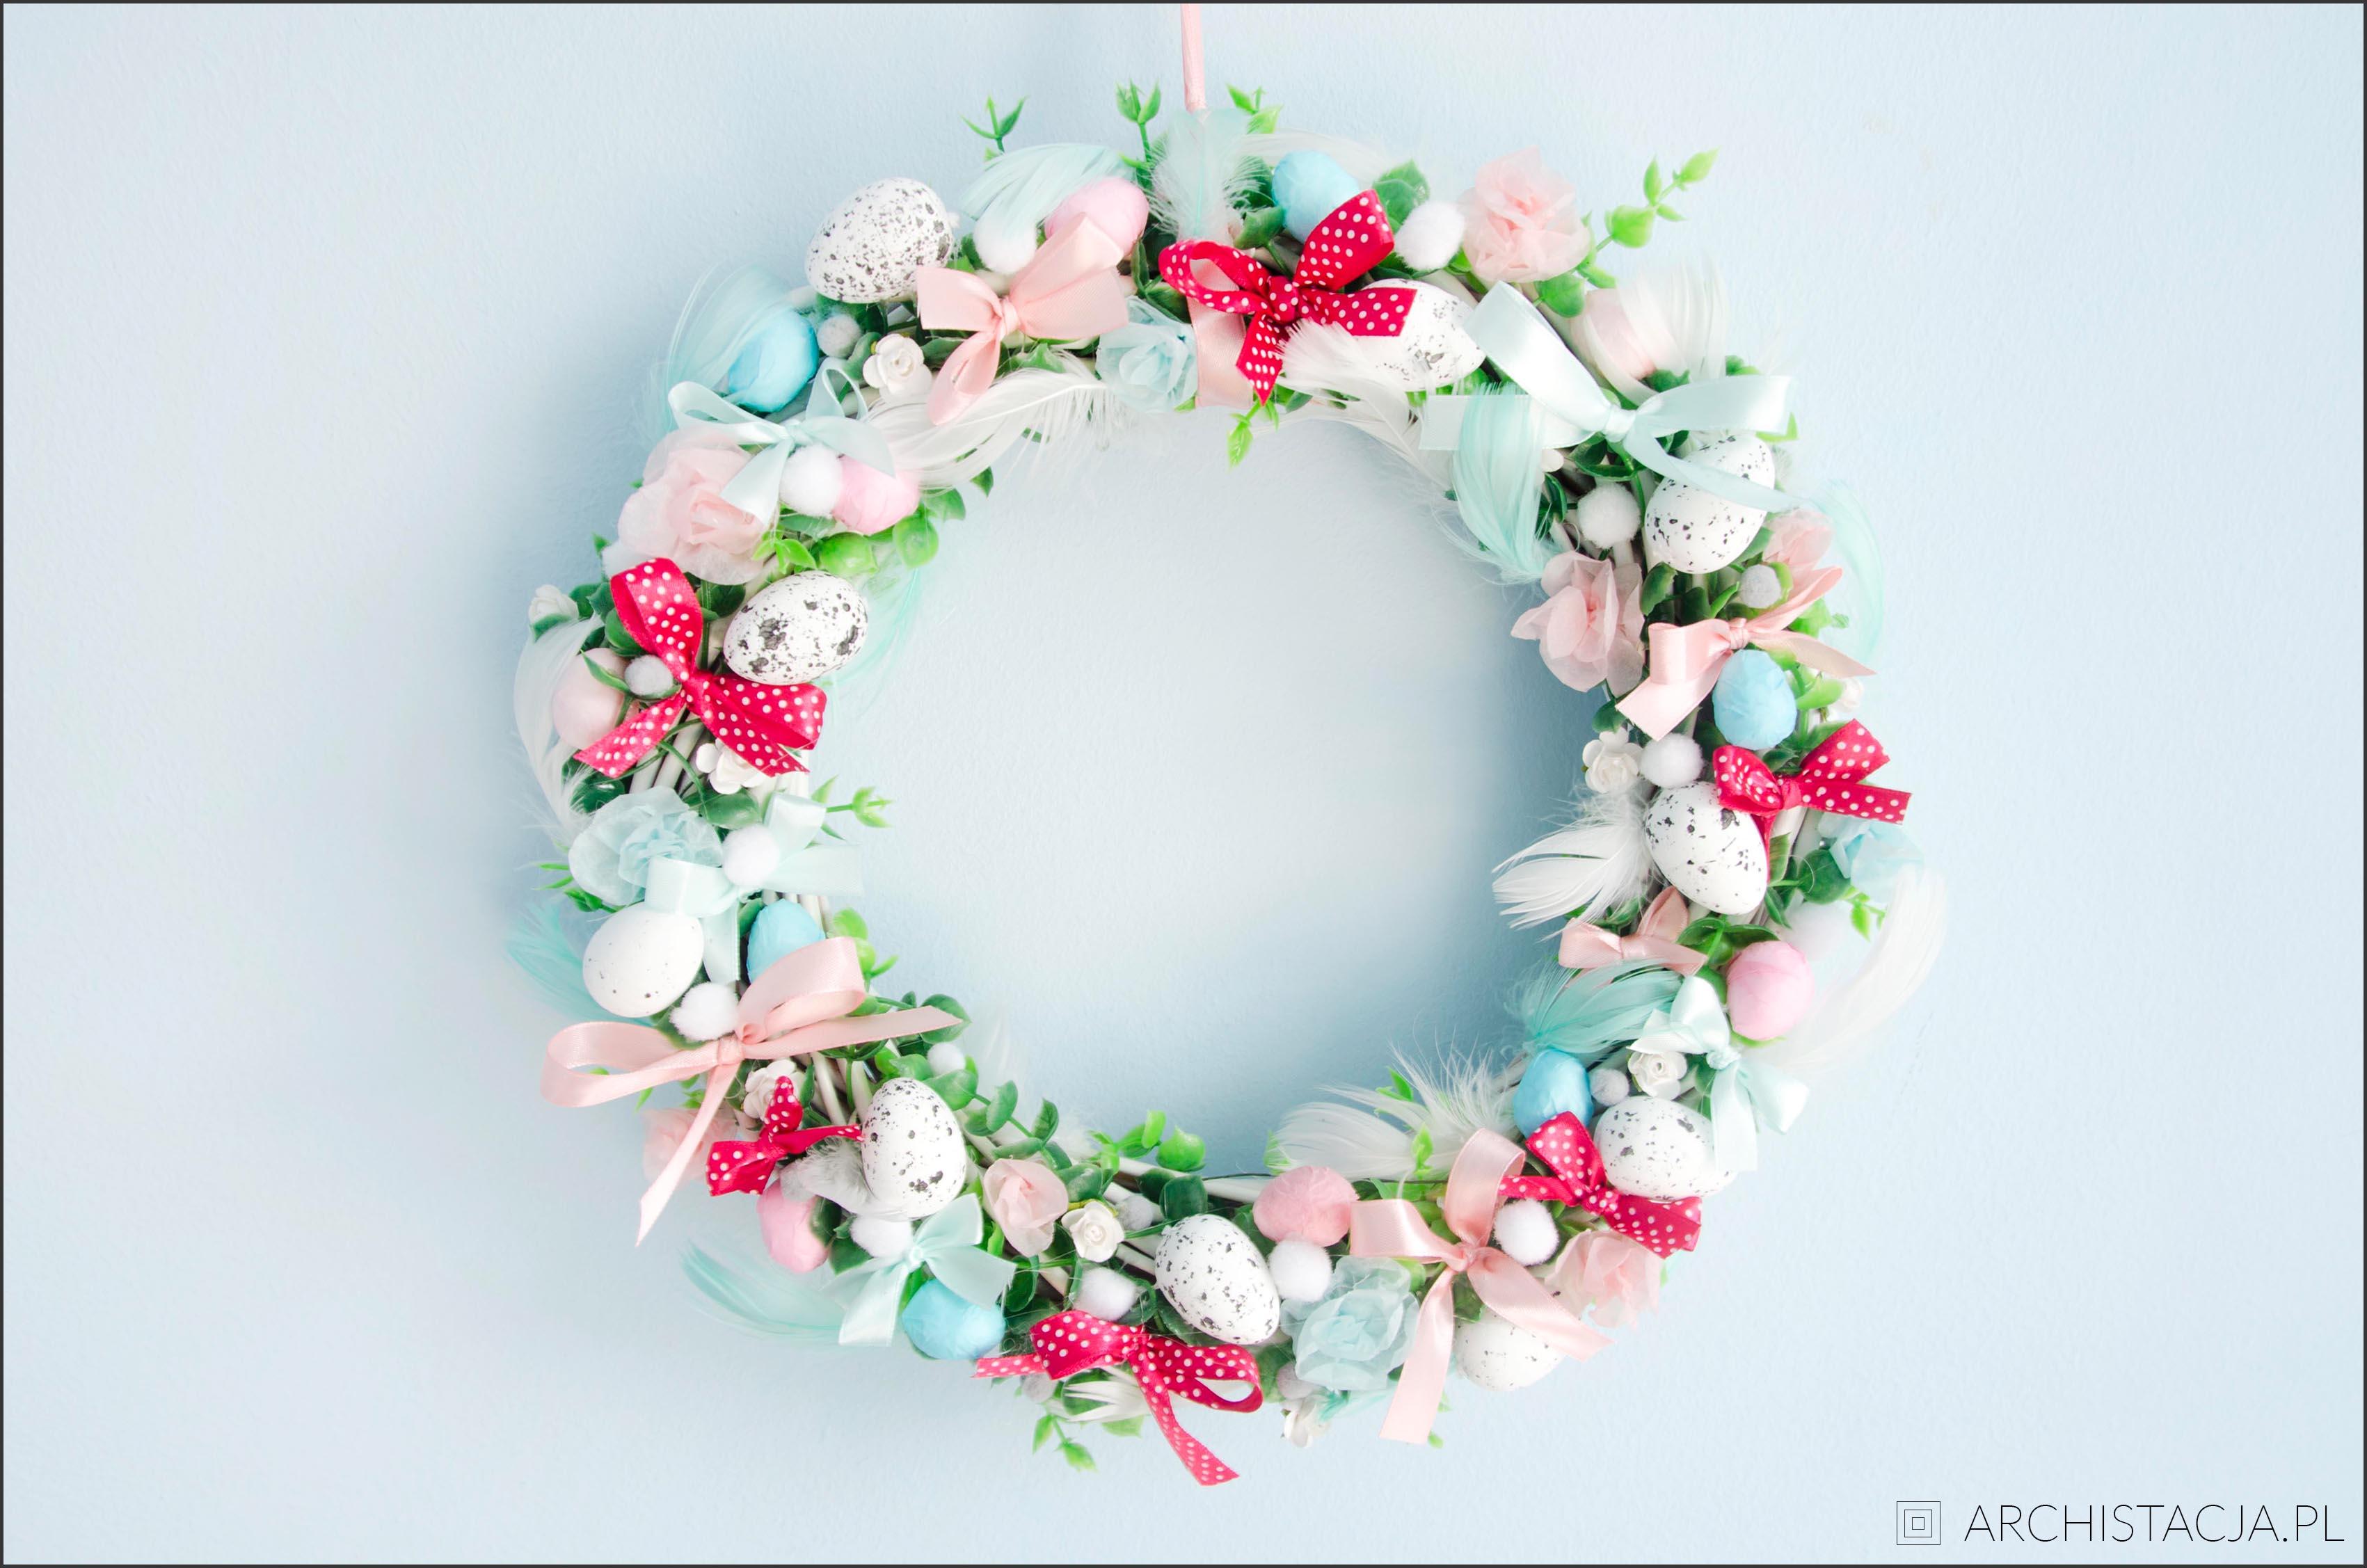 Picture Of Christmas Decorations Wielkanocny Wianek Diy Archistacja Pl